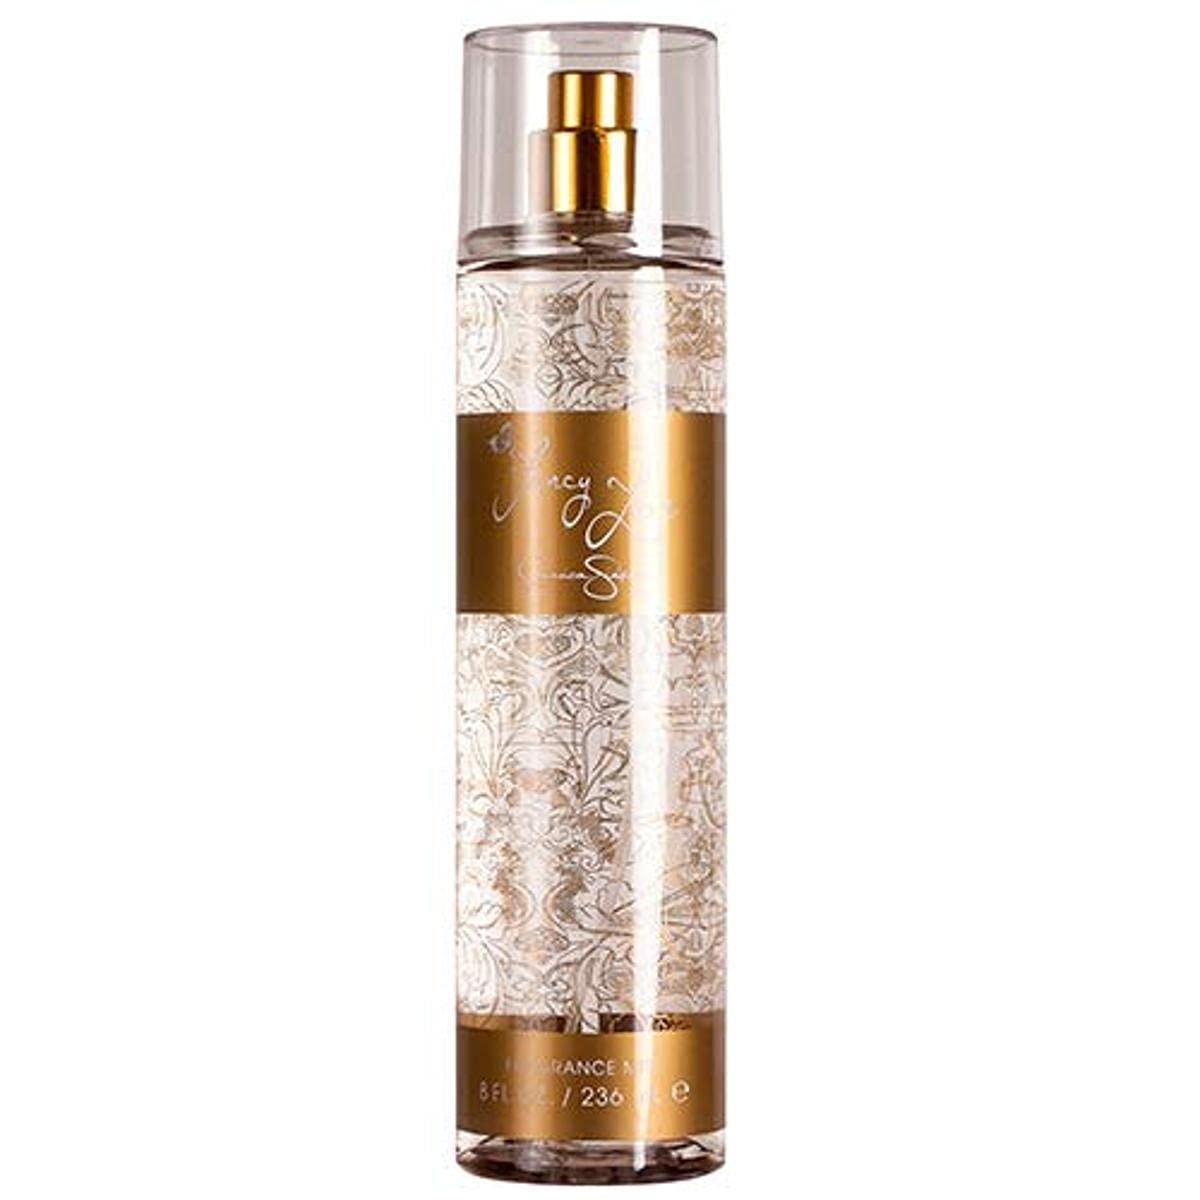 Jessica Simpson Oakland Mall Fancy Ranking TOP15 Love for Women 8 Fluid Ounce Body Spray